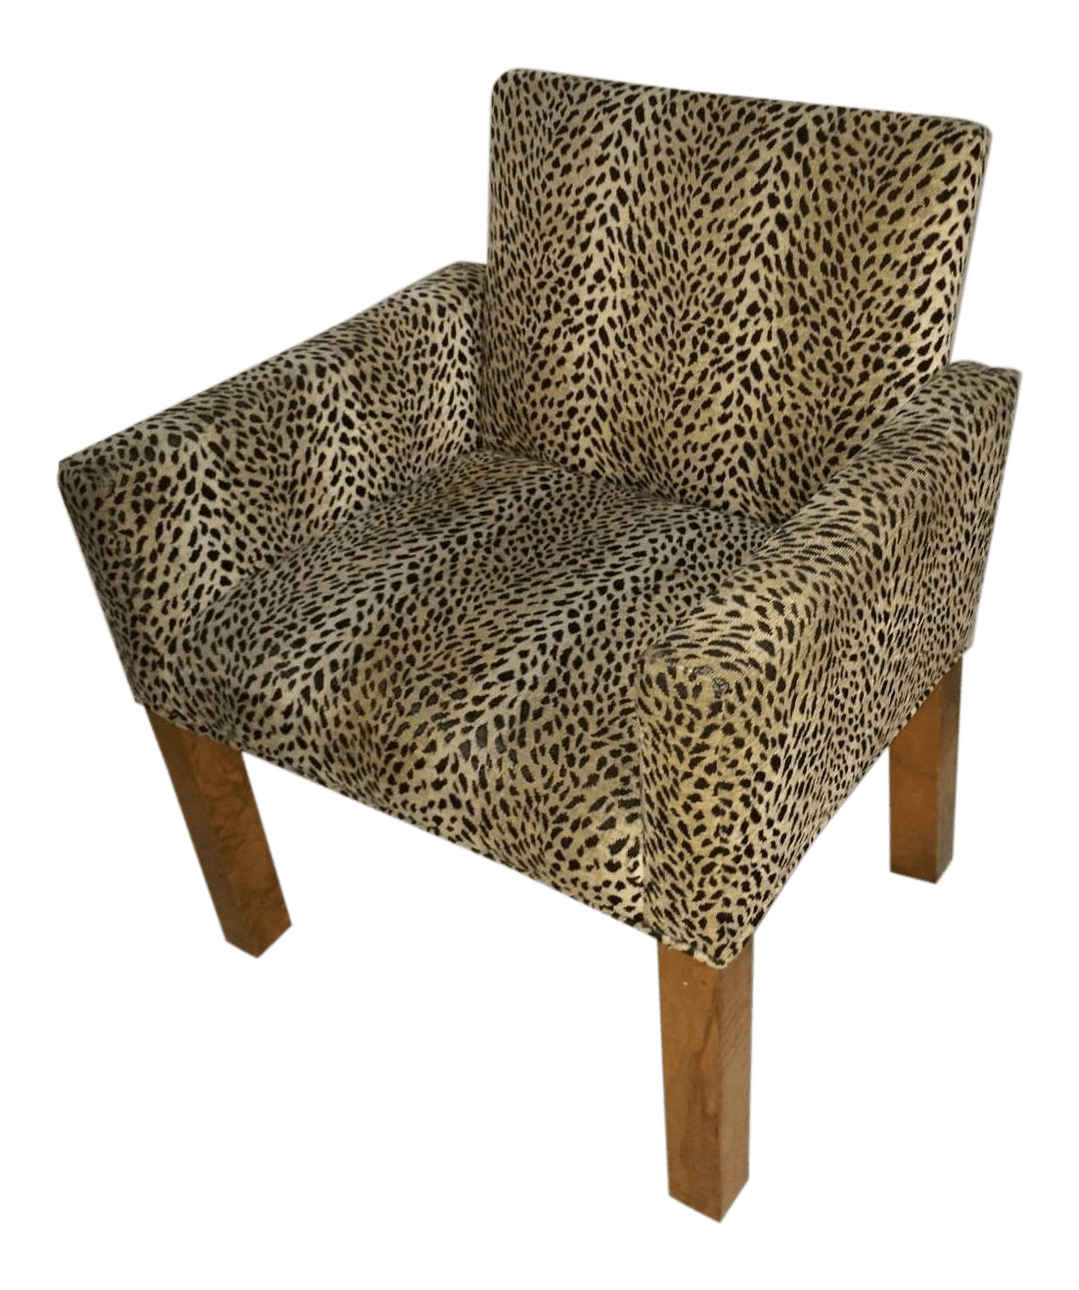 animal print accent chairs walmart patio chair 17 leopard chairish